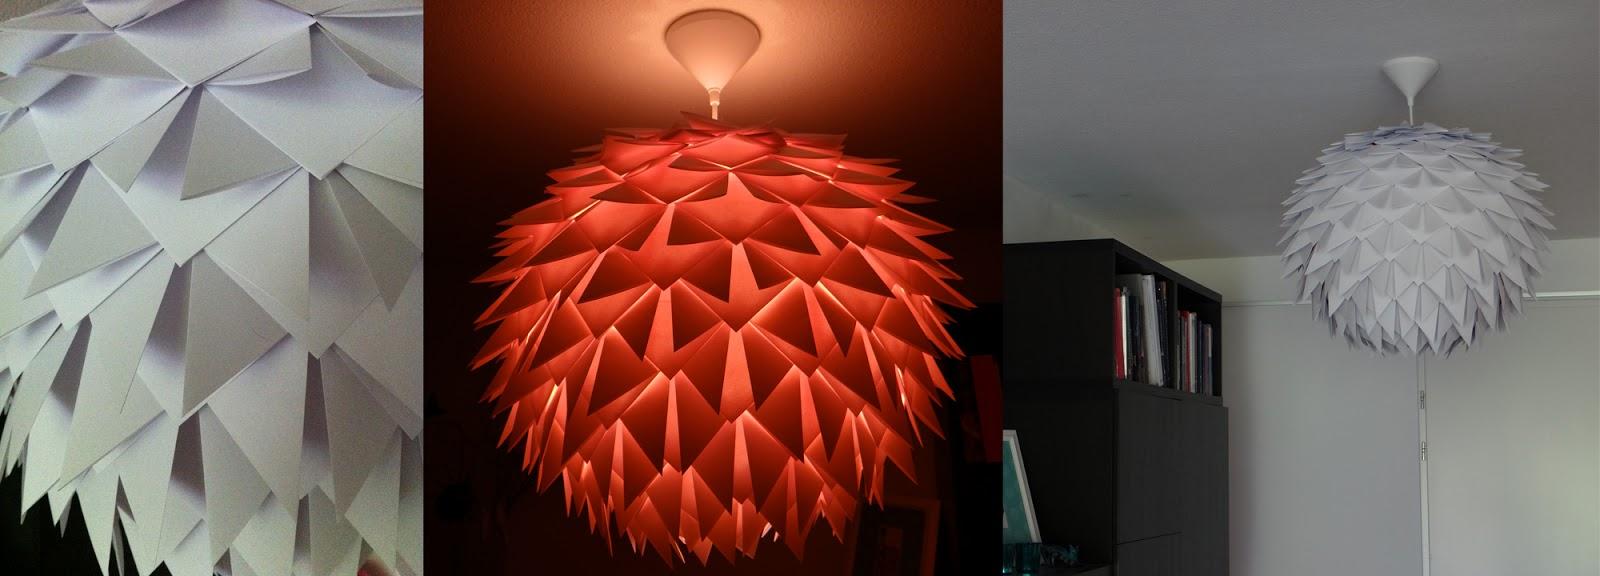 origami lamp photo - 3